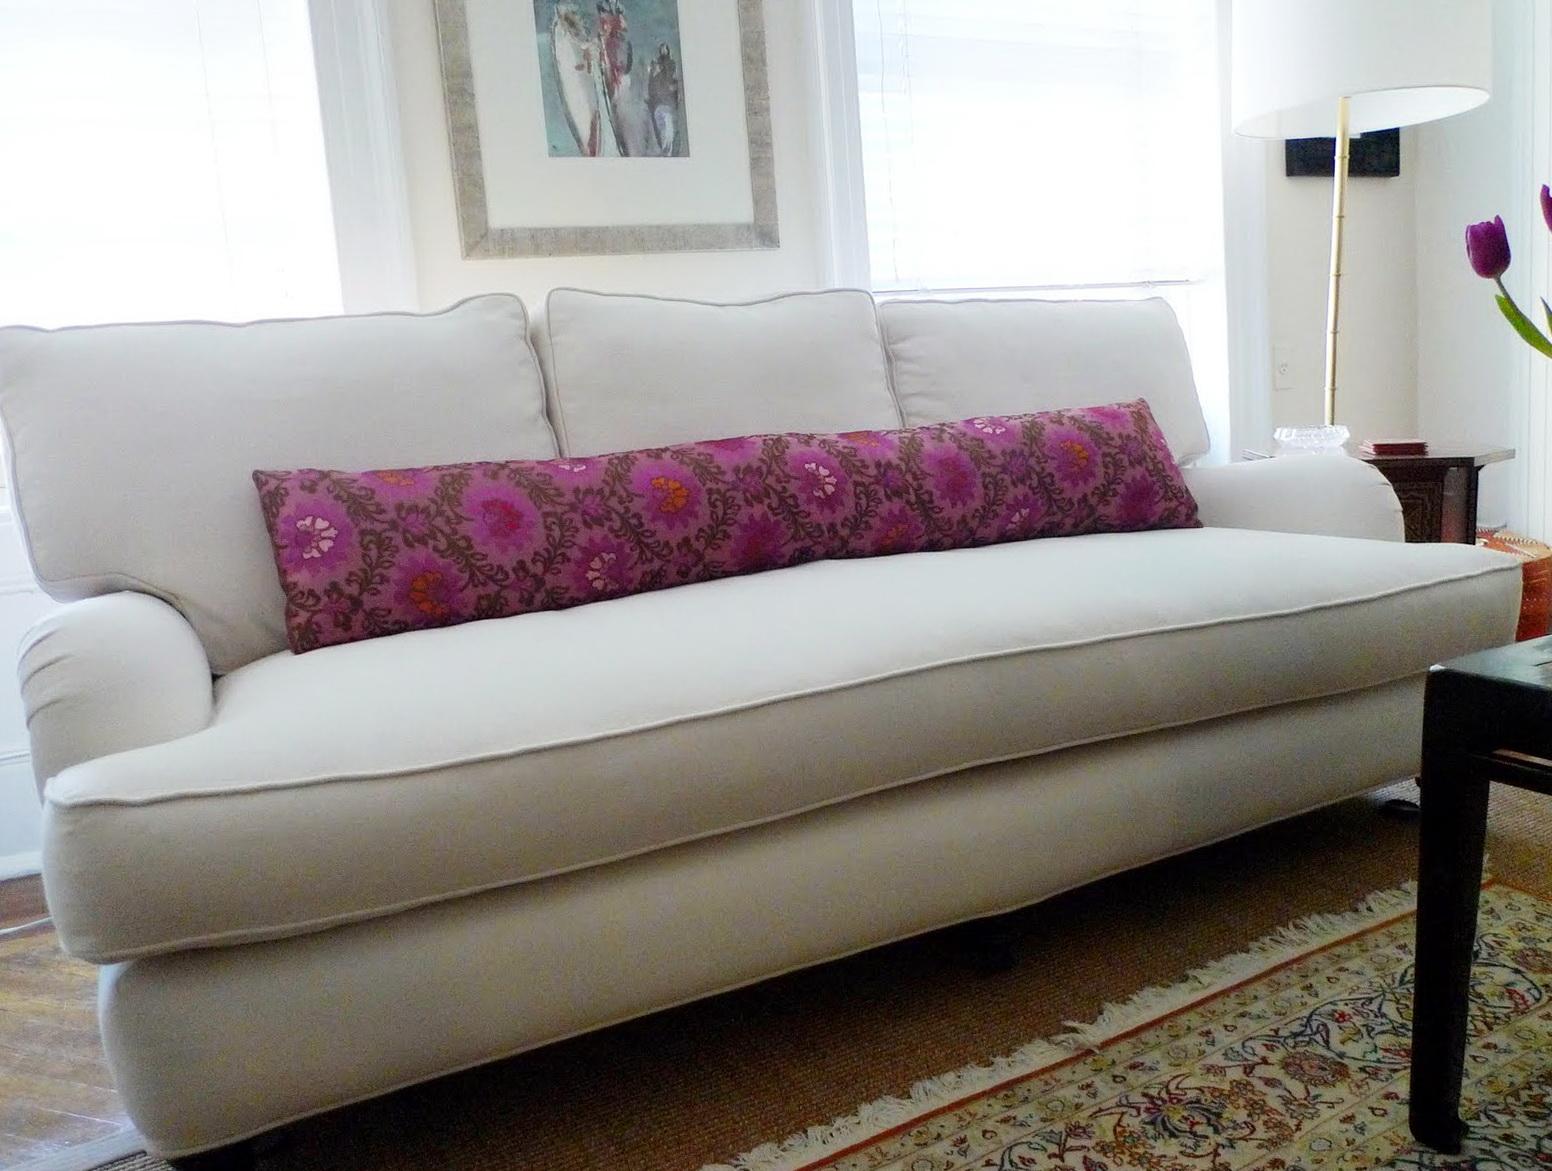 Sofa One Seat Cushion